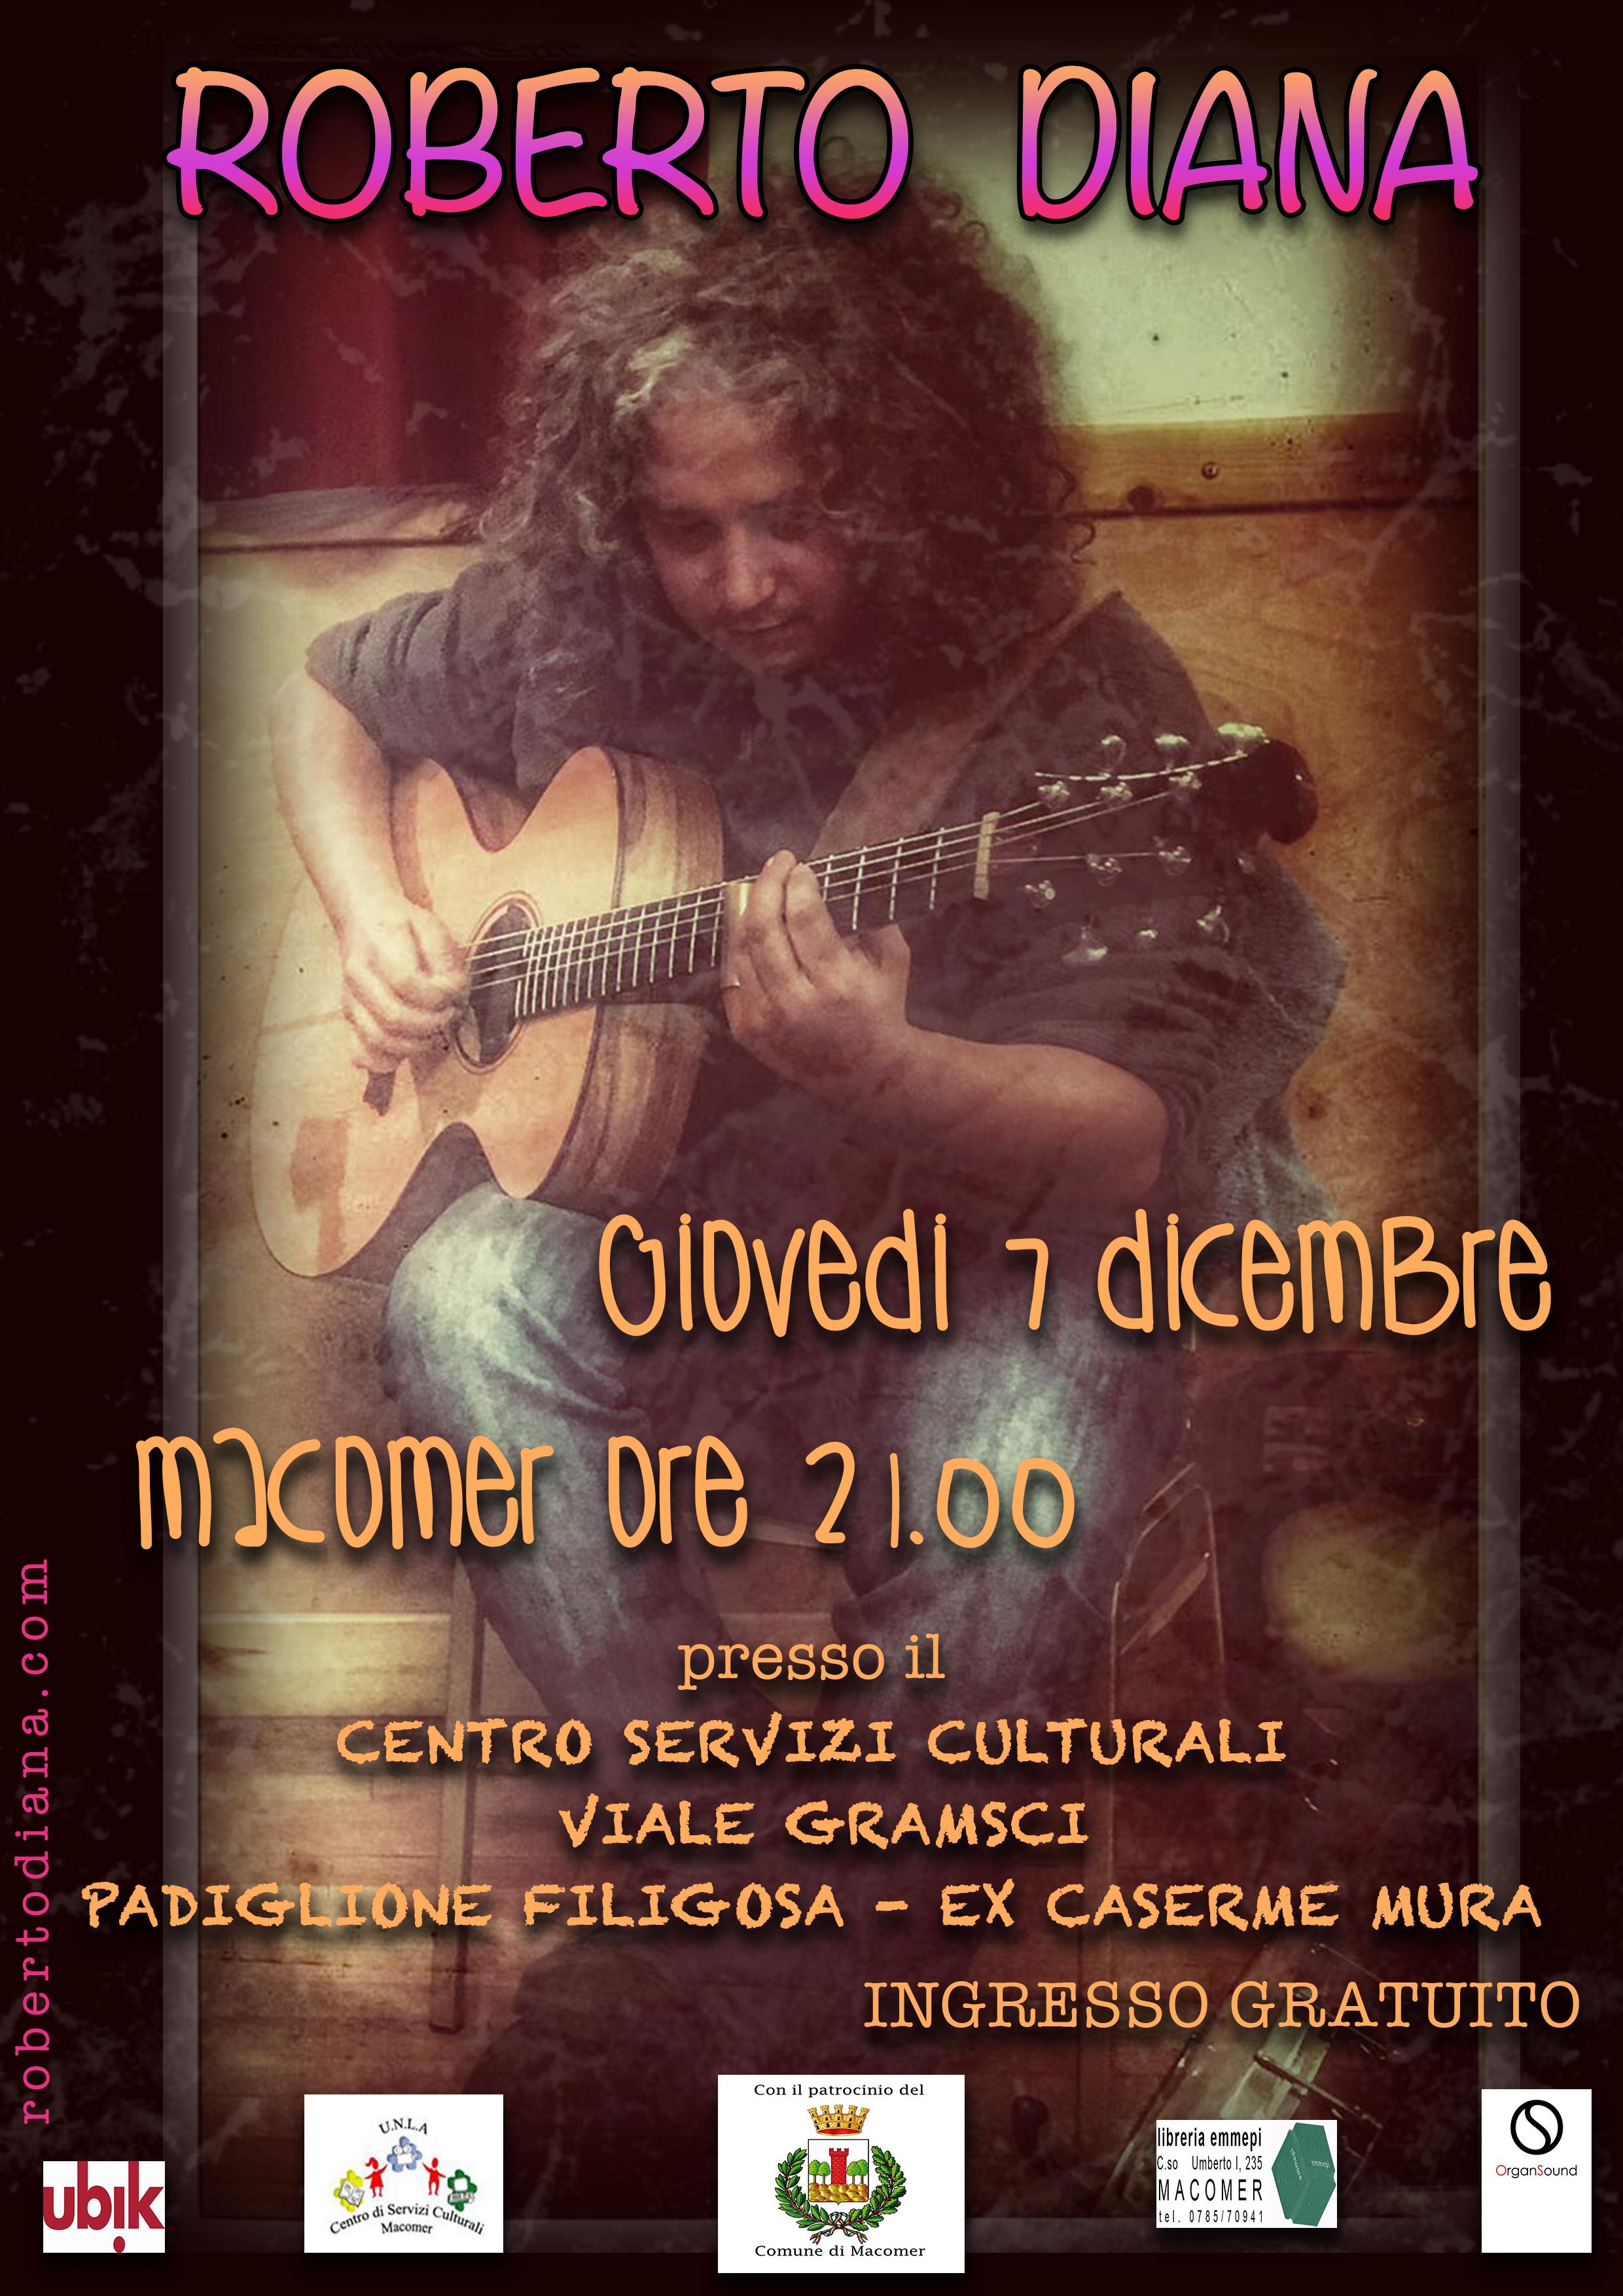 Macomer Roberto Diana il Centro Culturale UBIK Libreria EMMEPI Organ Sound